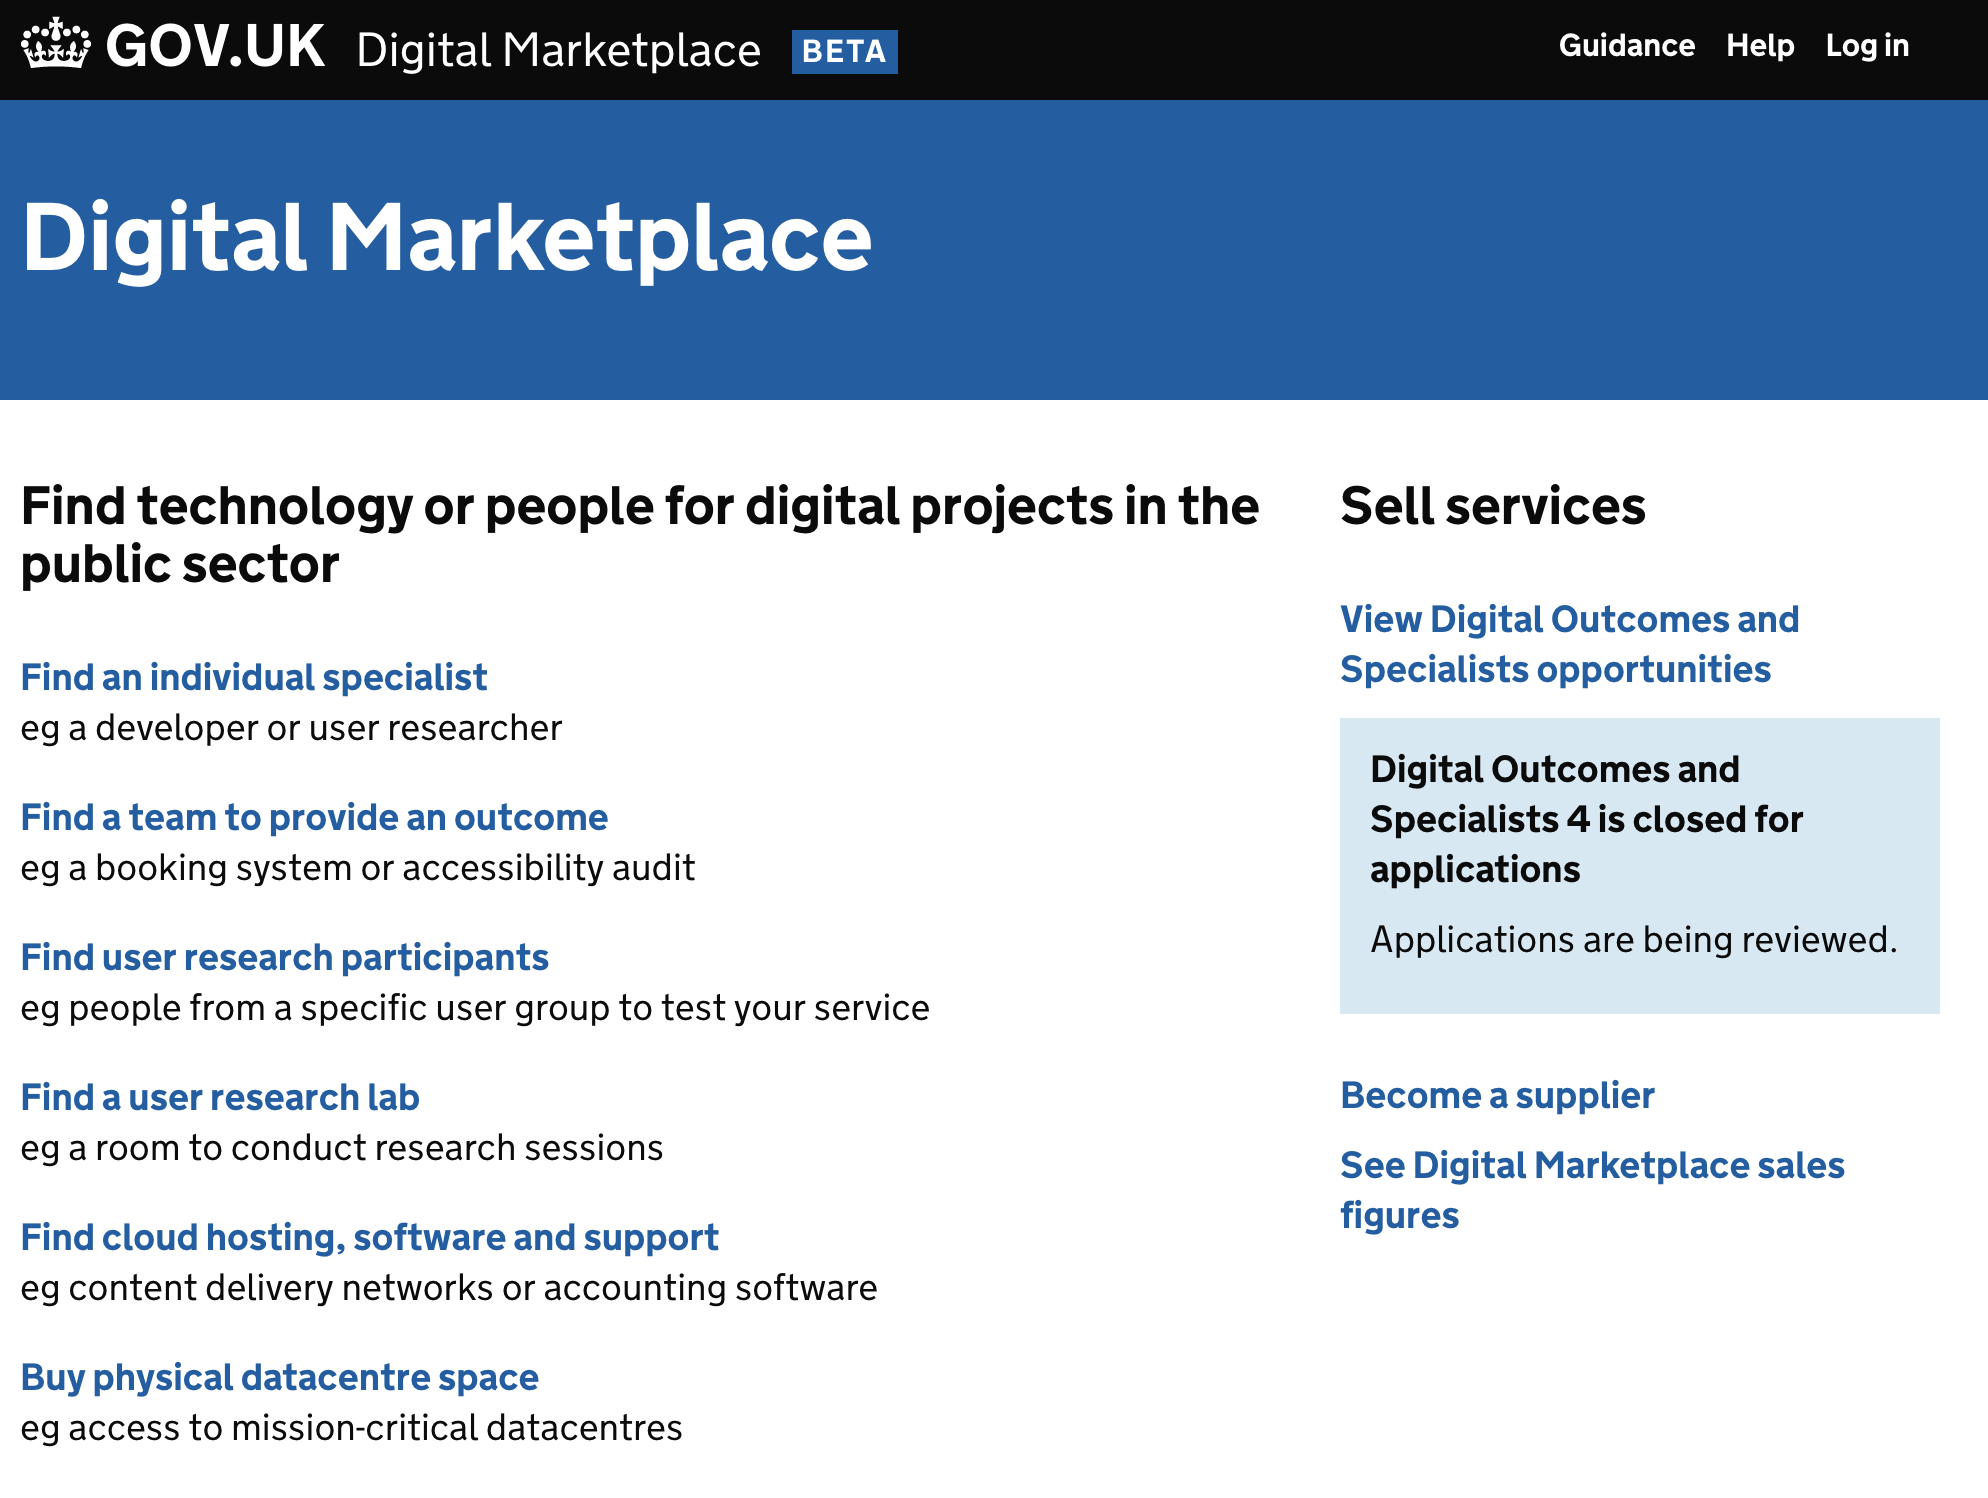 UK gov.uk site Digital Marketplace